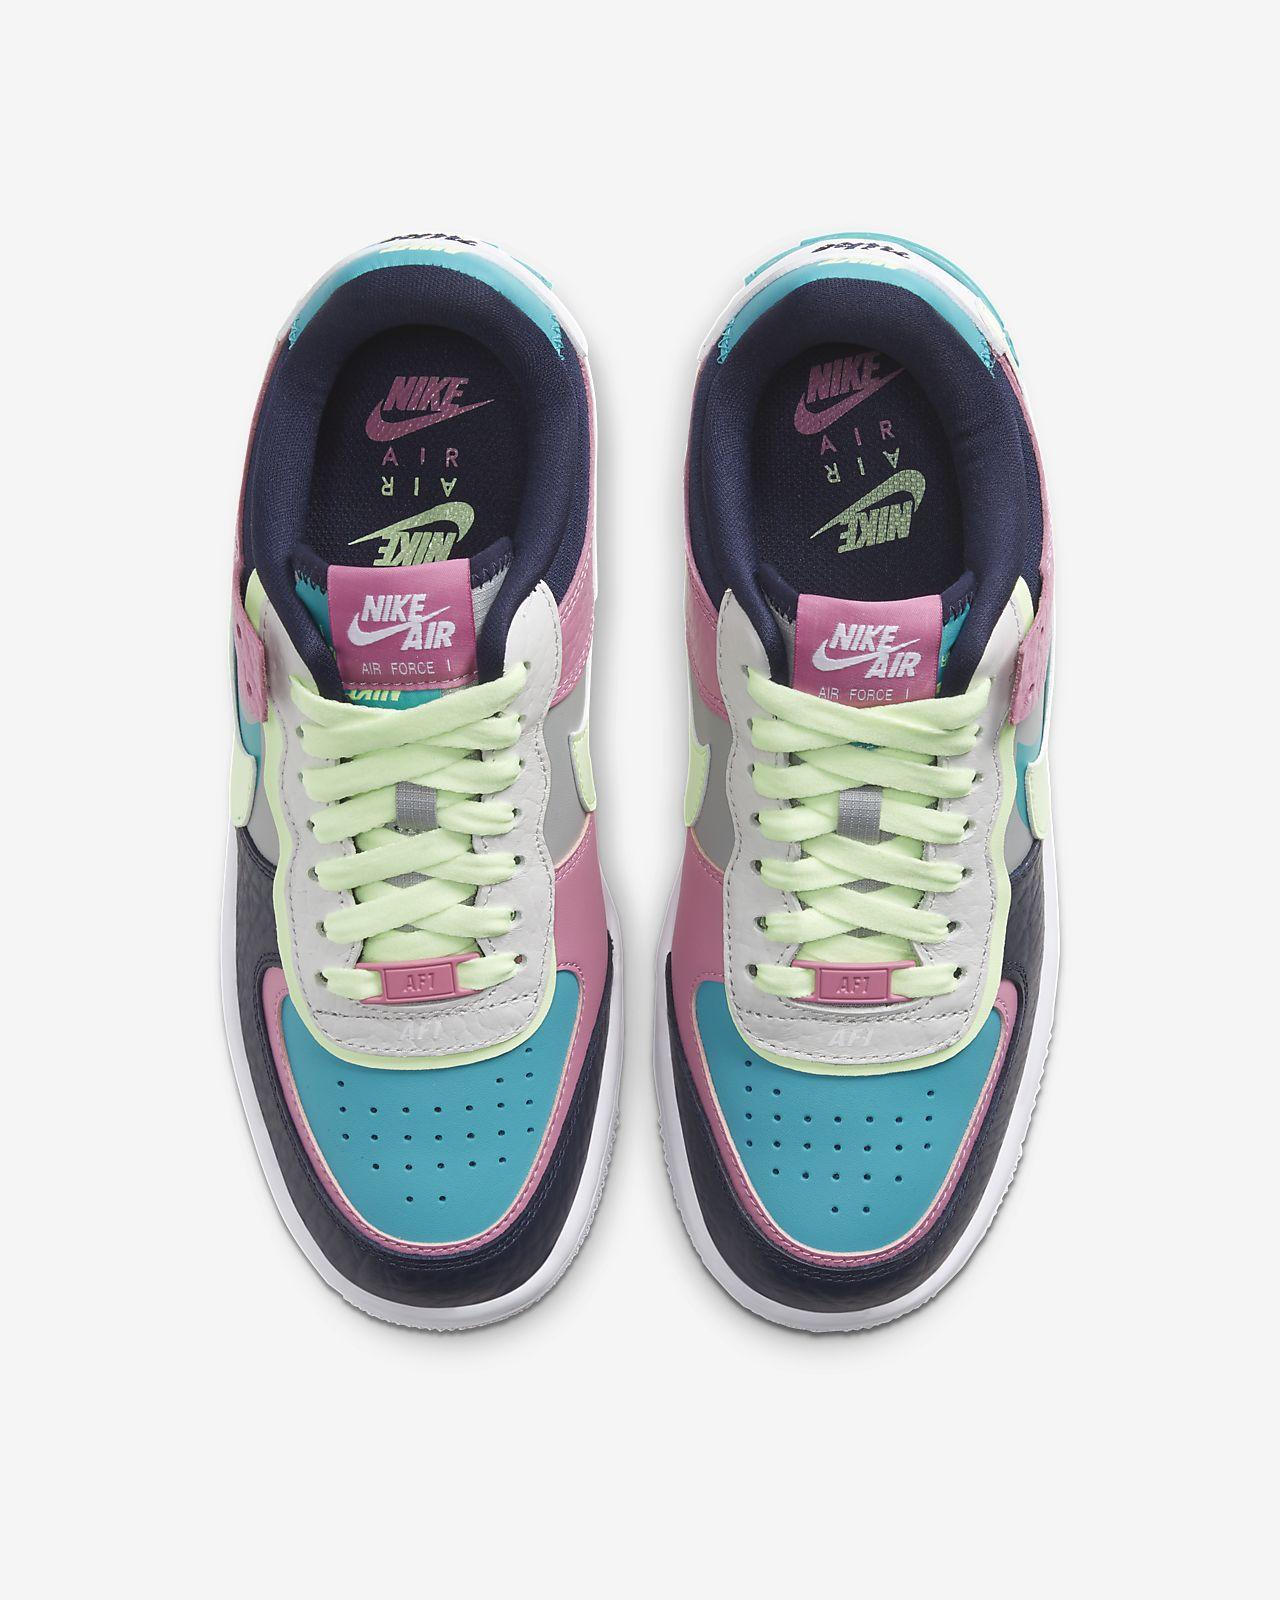 Nike Air Force 1 Shadow SE Womens CK3172 001